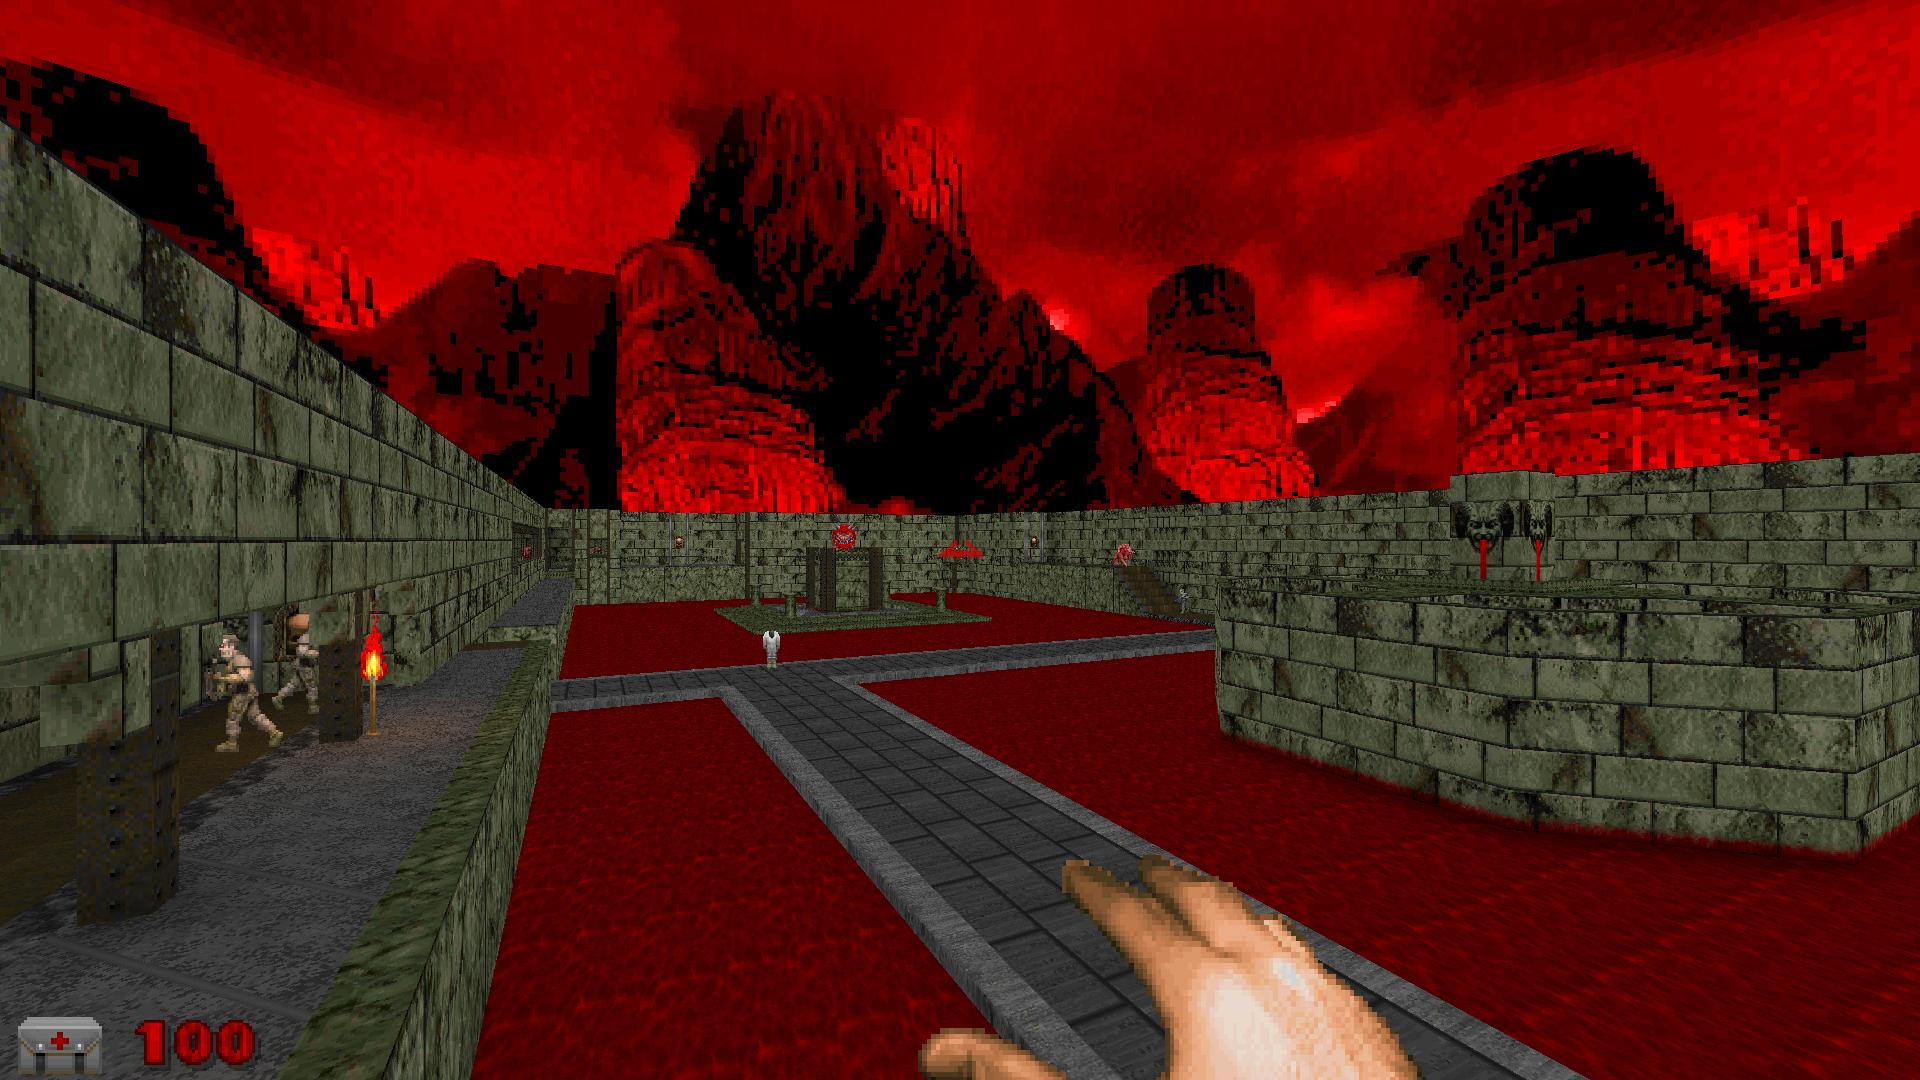 Screenshot_Doom_20210401_132527.png.c7e5584e42b1b824fb029c4b09d0fdca.png